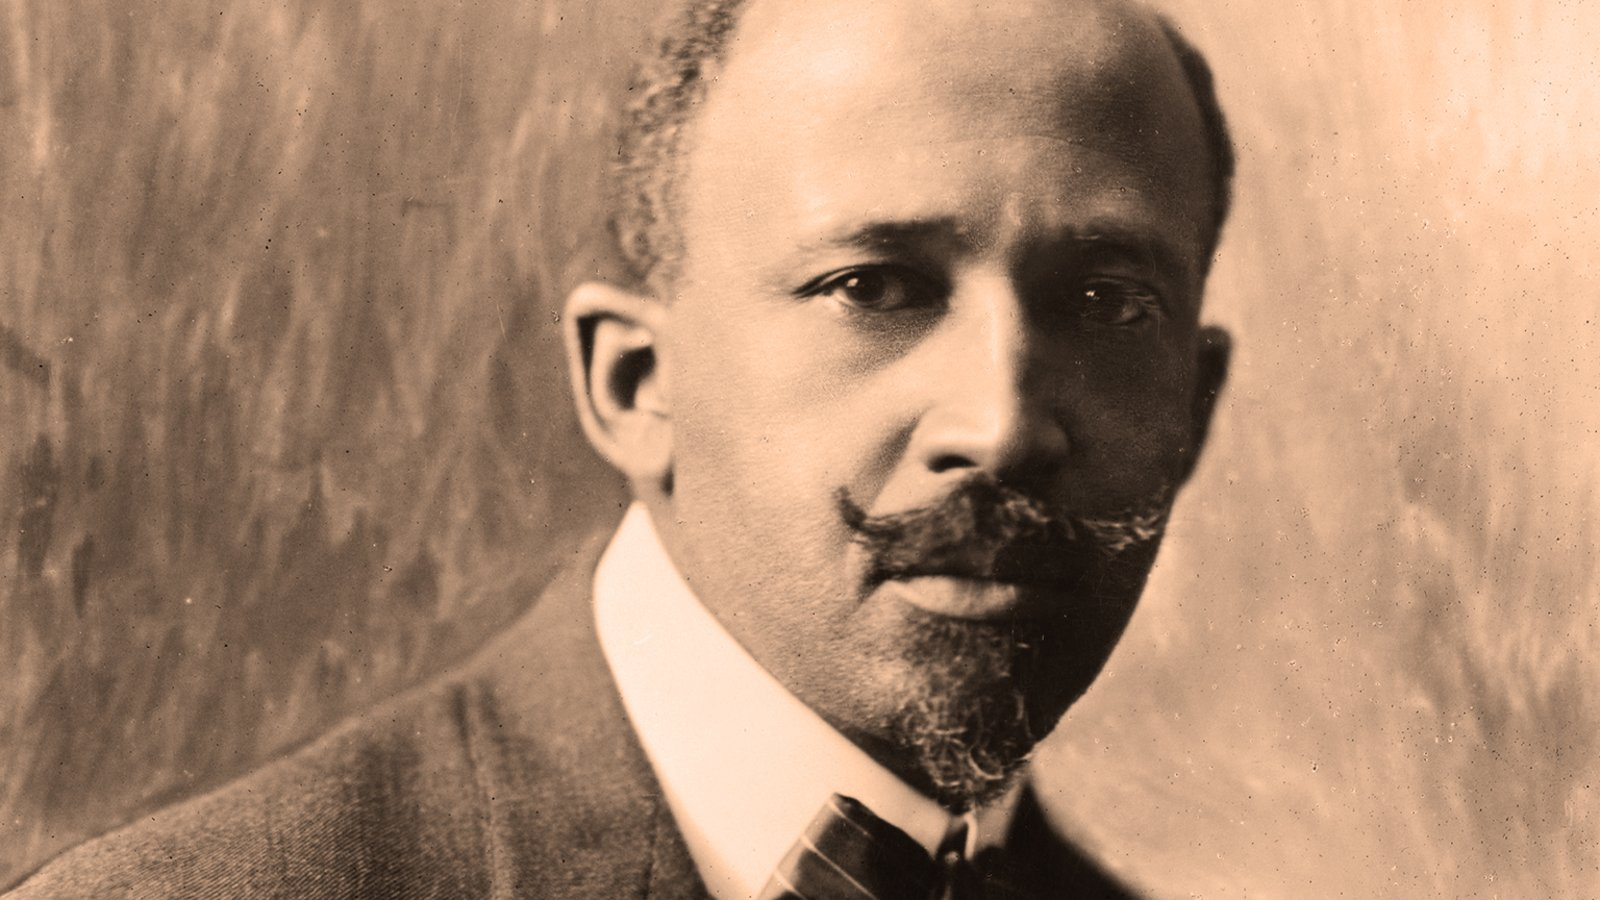 Early Civil Rights: Washington or Du Bois?